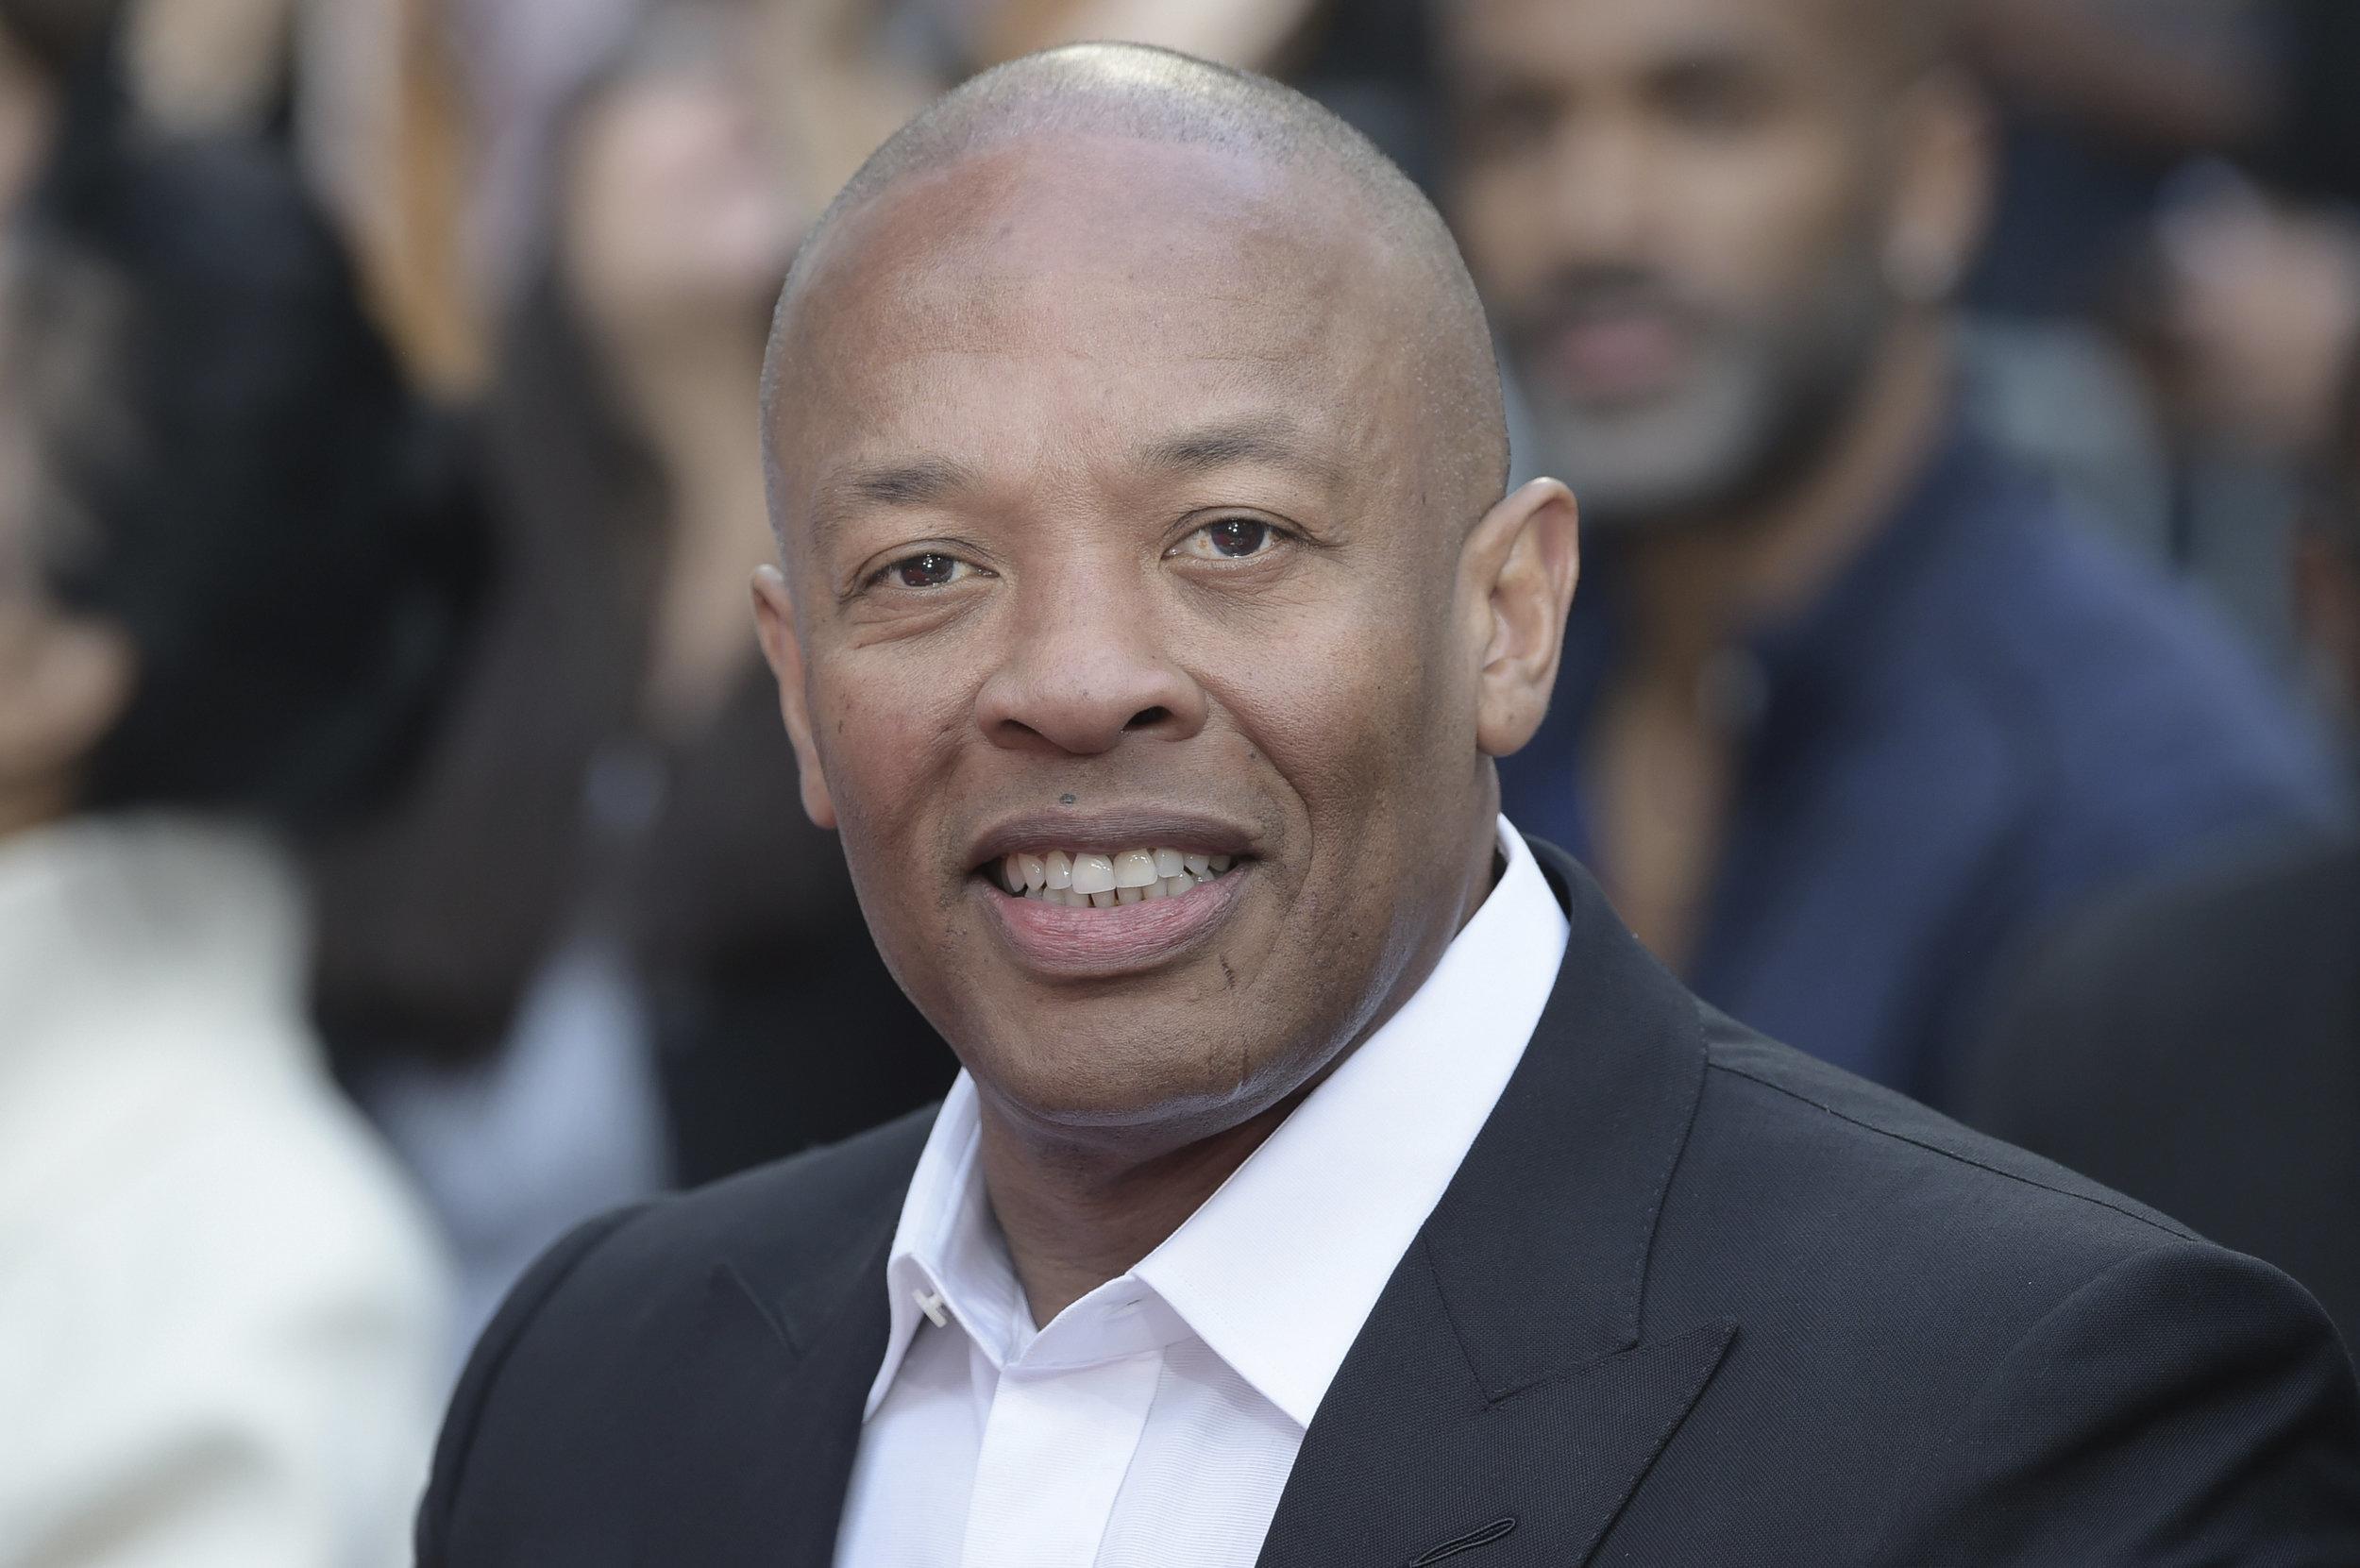 Dr. Dre's Post Wasn't An Insult, It Was A Flex